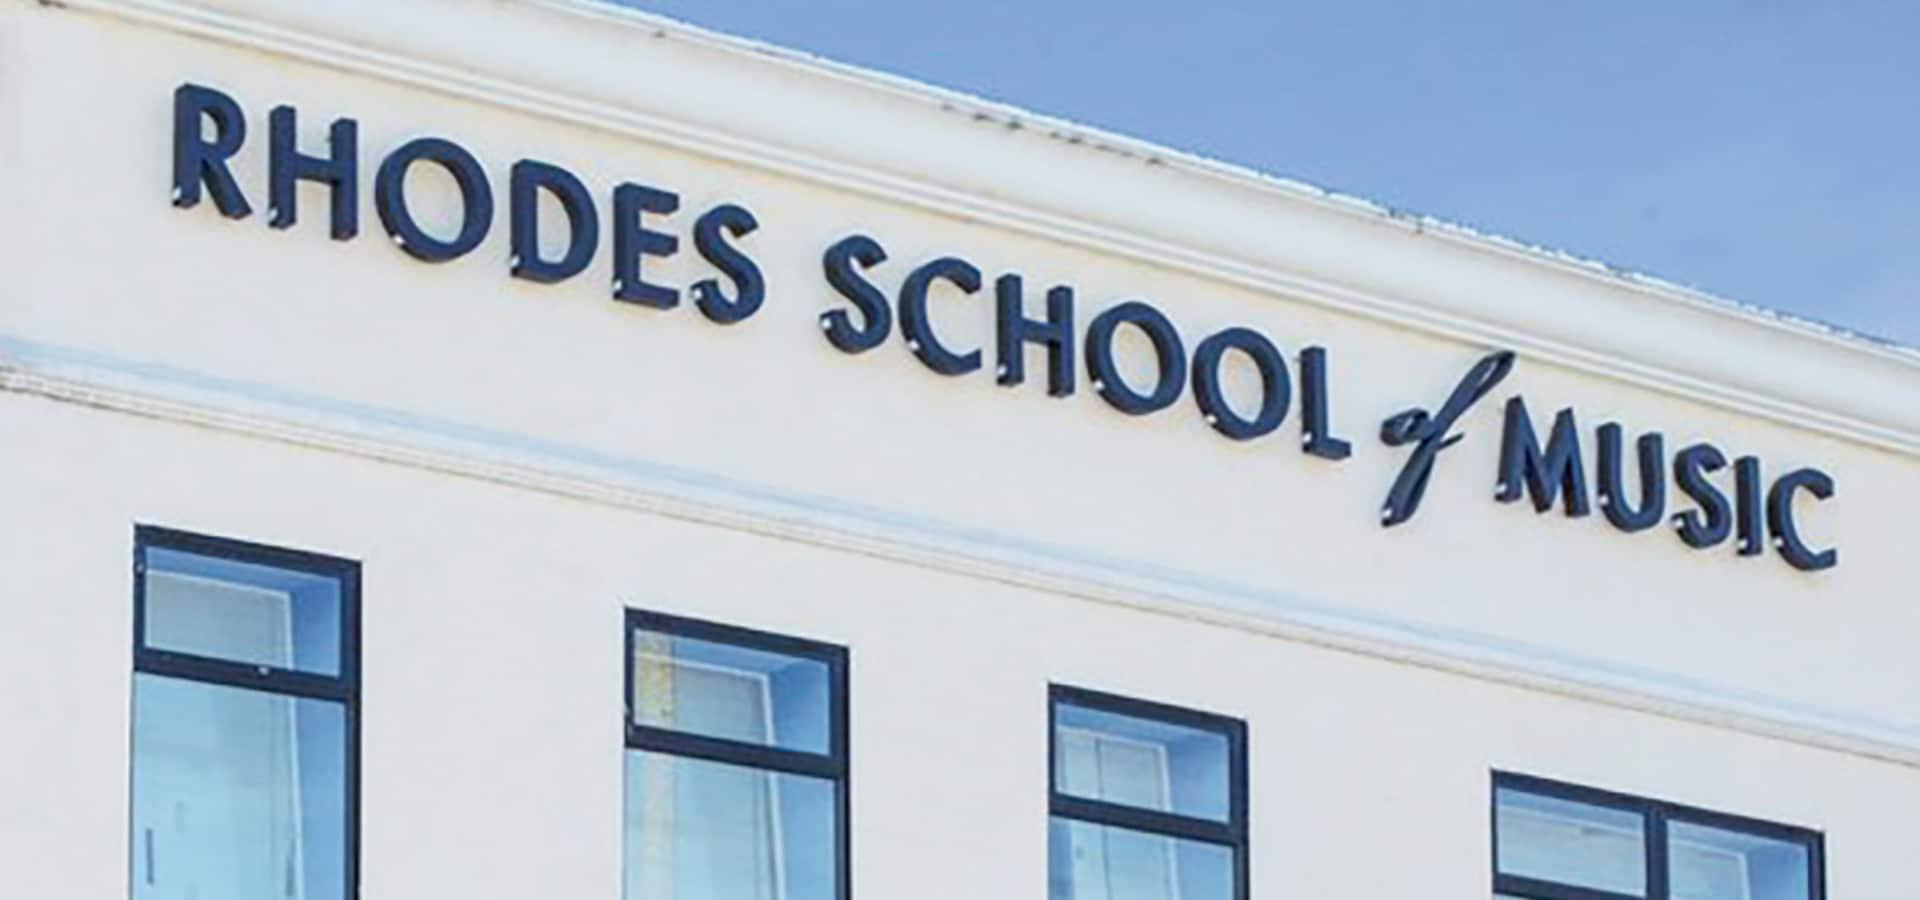 Rhodes School of Music Building